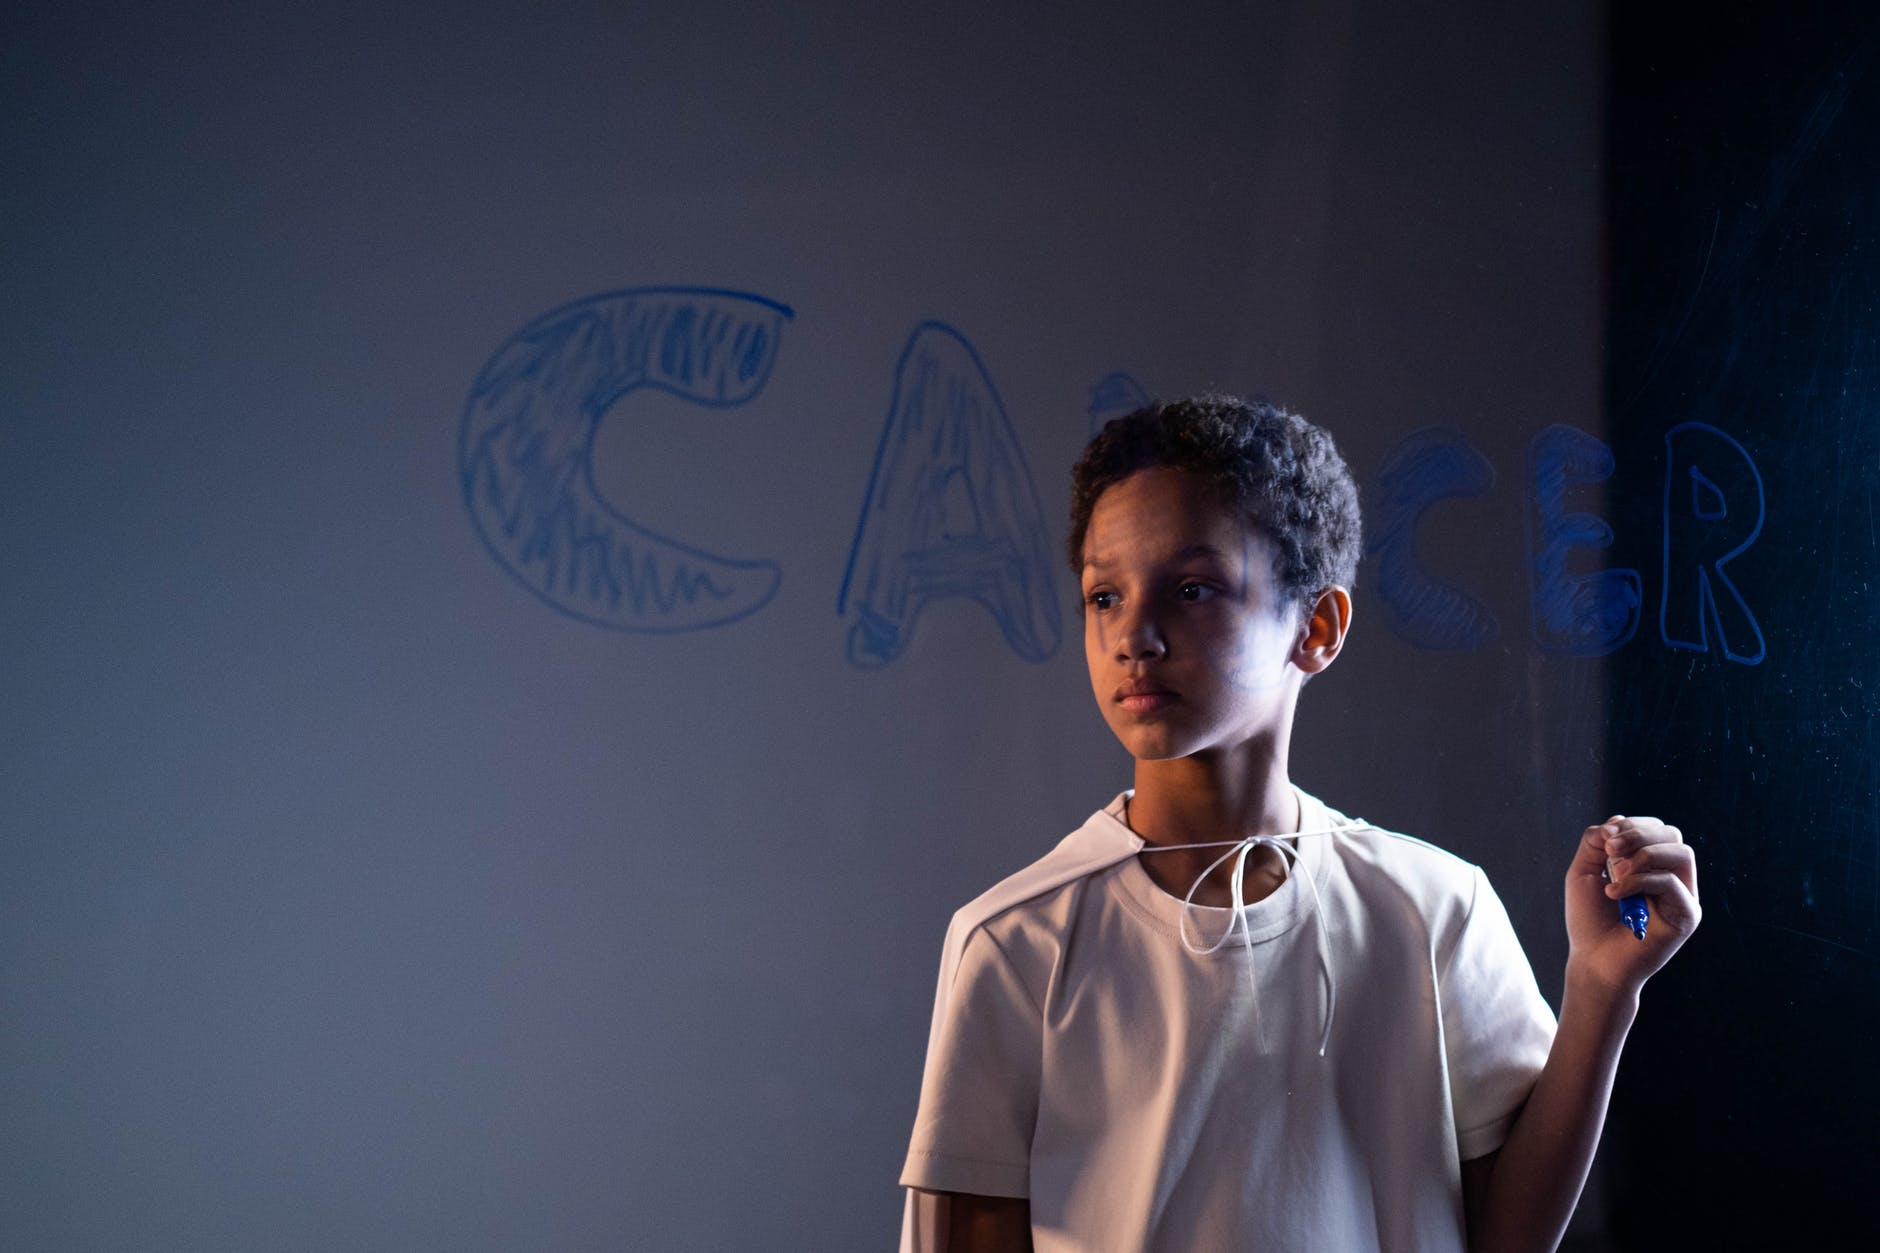 boy in white shirt holding blue marker